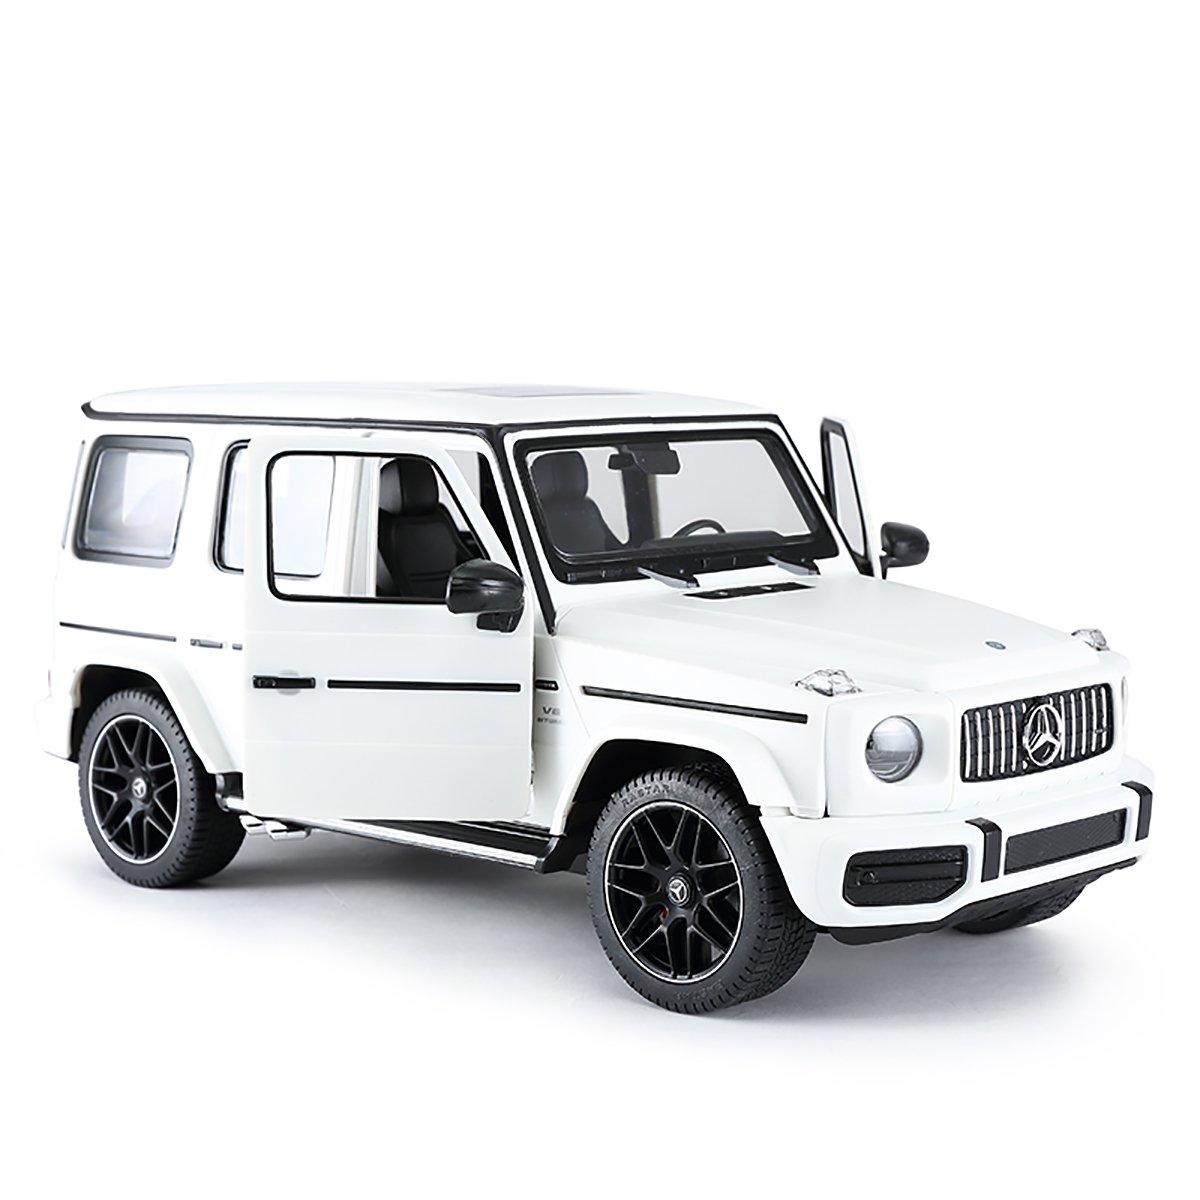 Masinuta cu telecomanda Rastar Mercedes-Benz G63 AMG, Alb, 1:14